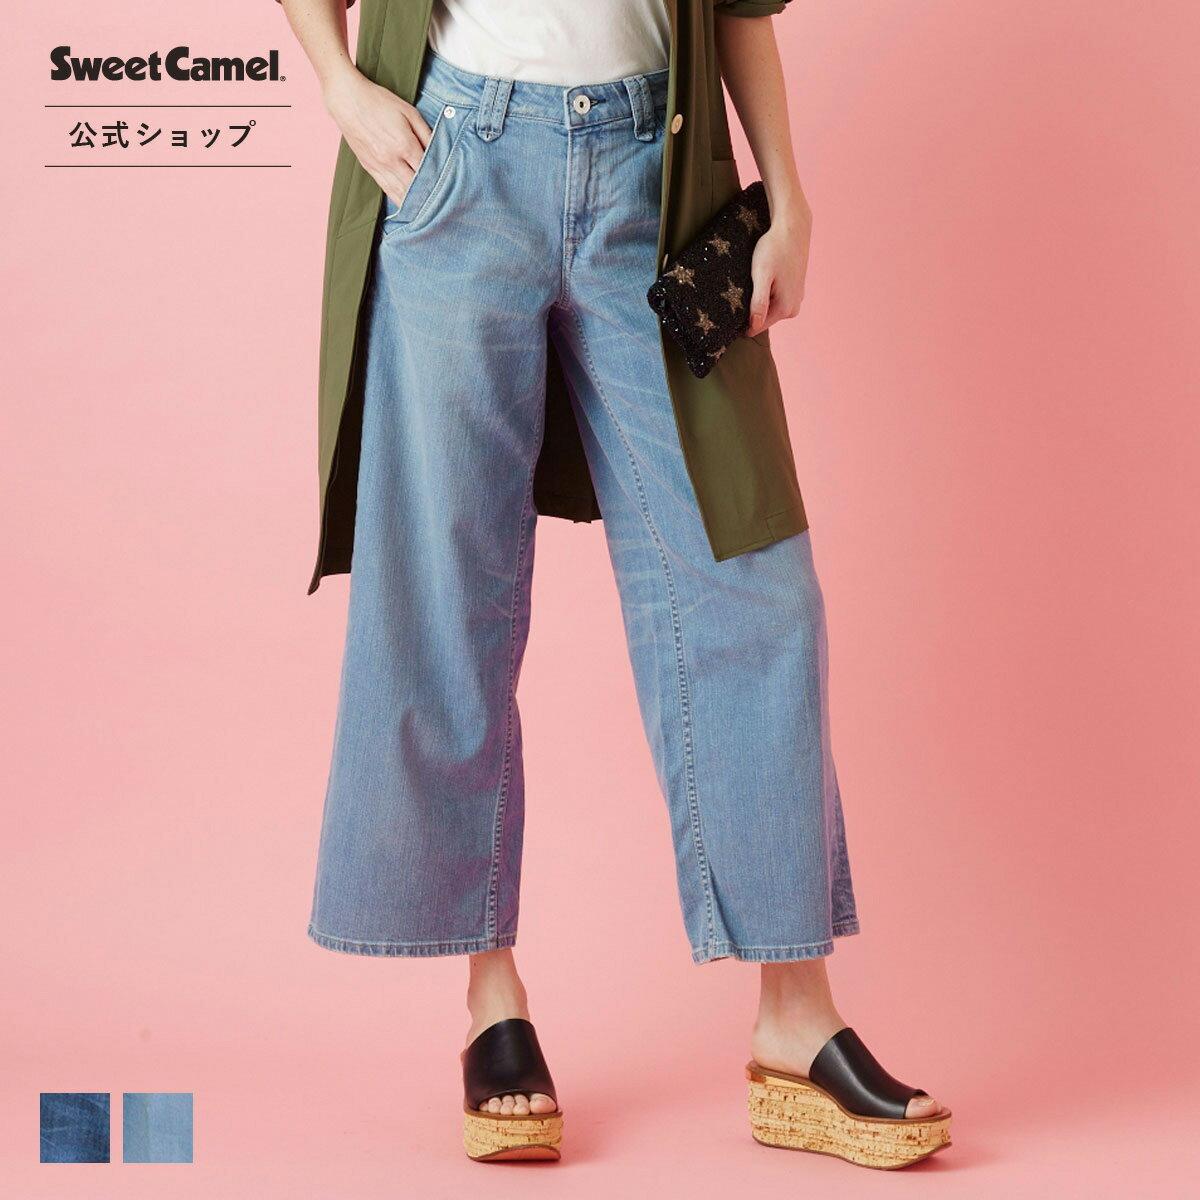 【Sweet Camel公式】 スウィートキャメ...の商品画像